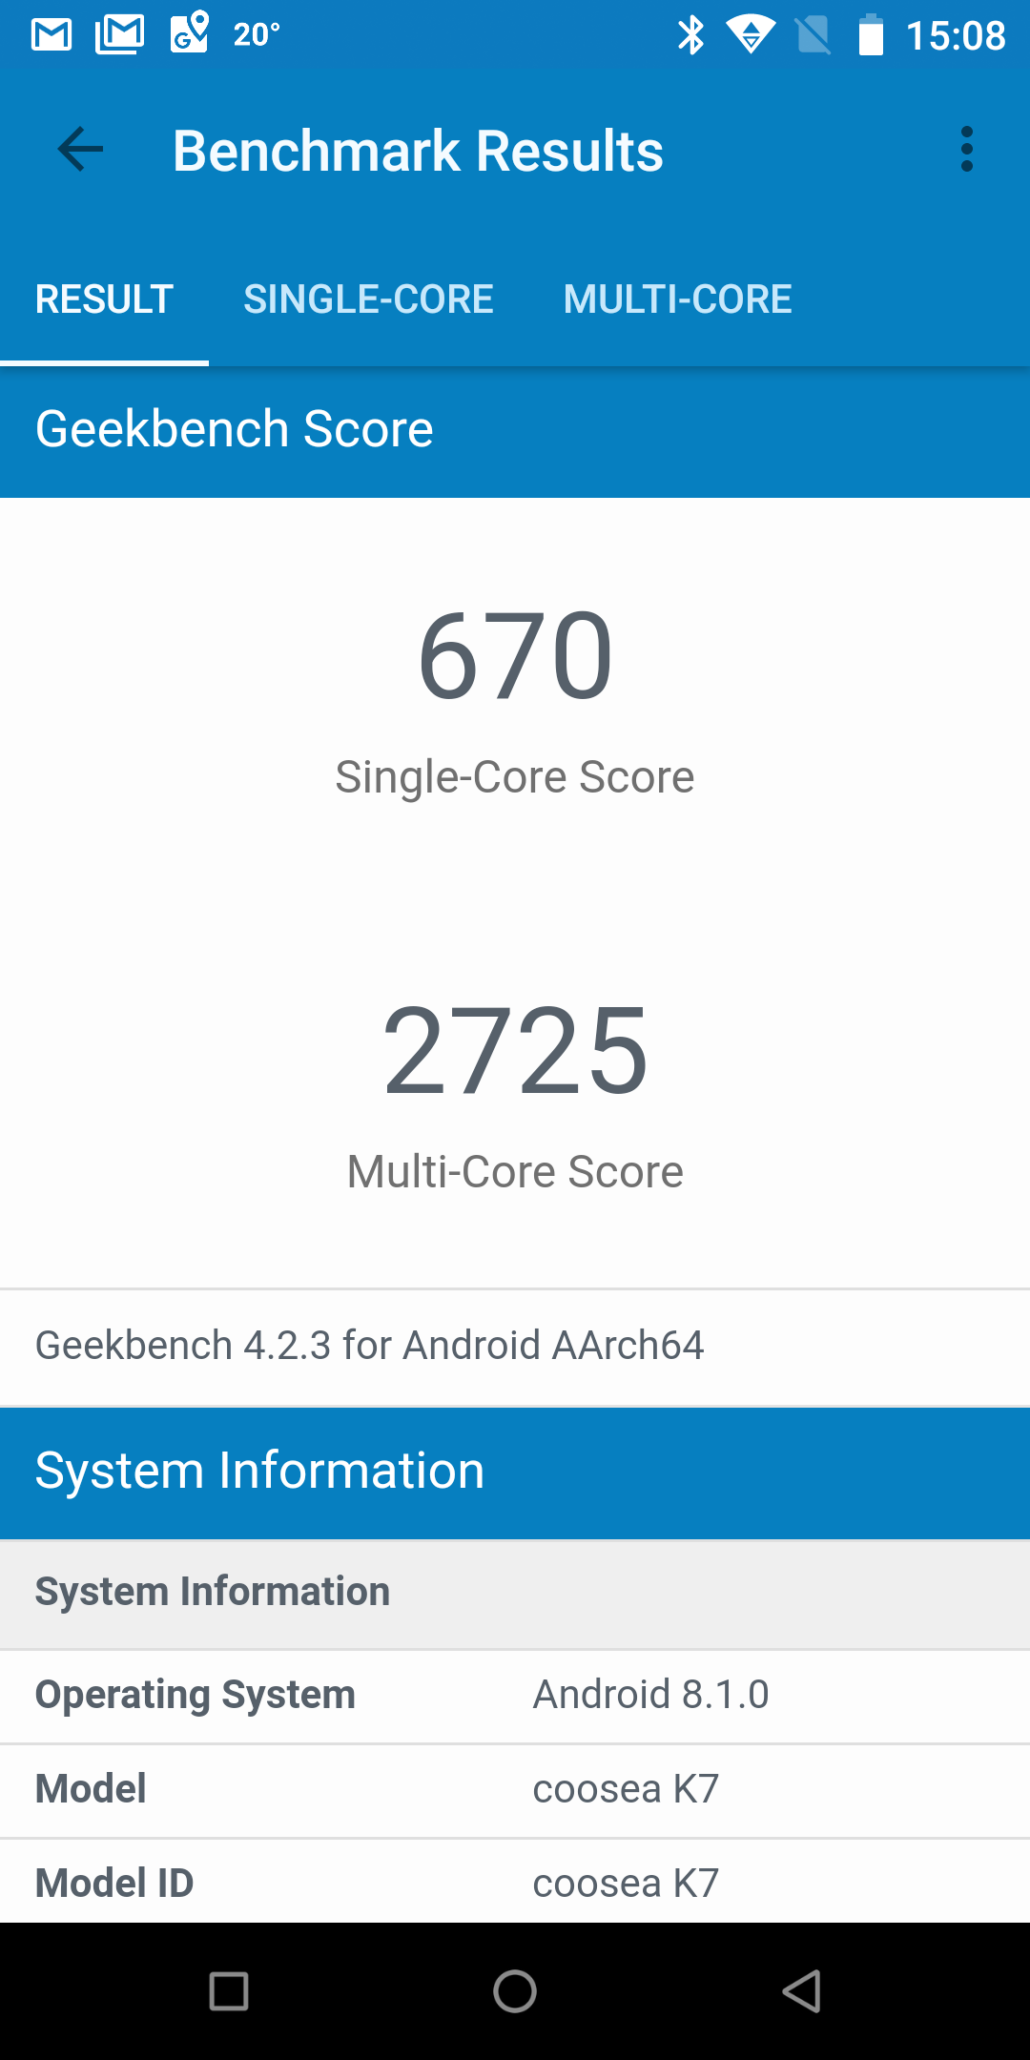 oukitel-k7-phone-review-06-part-1-geekbench-score